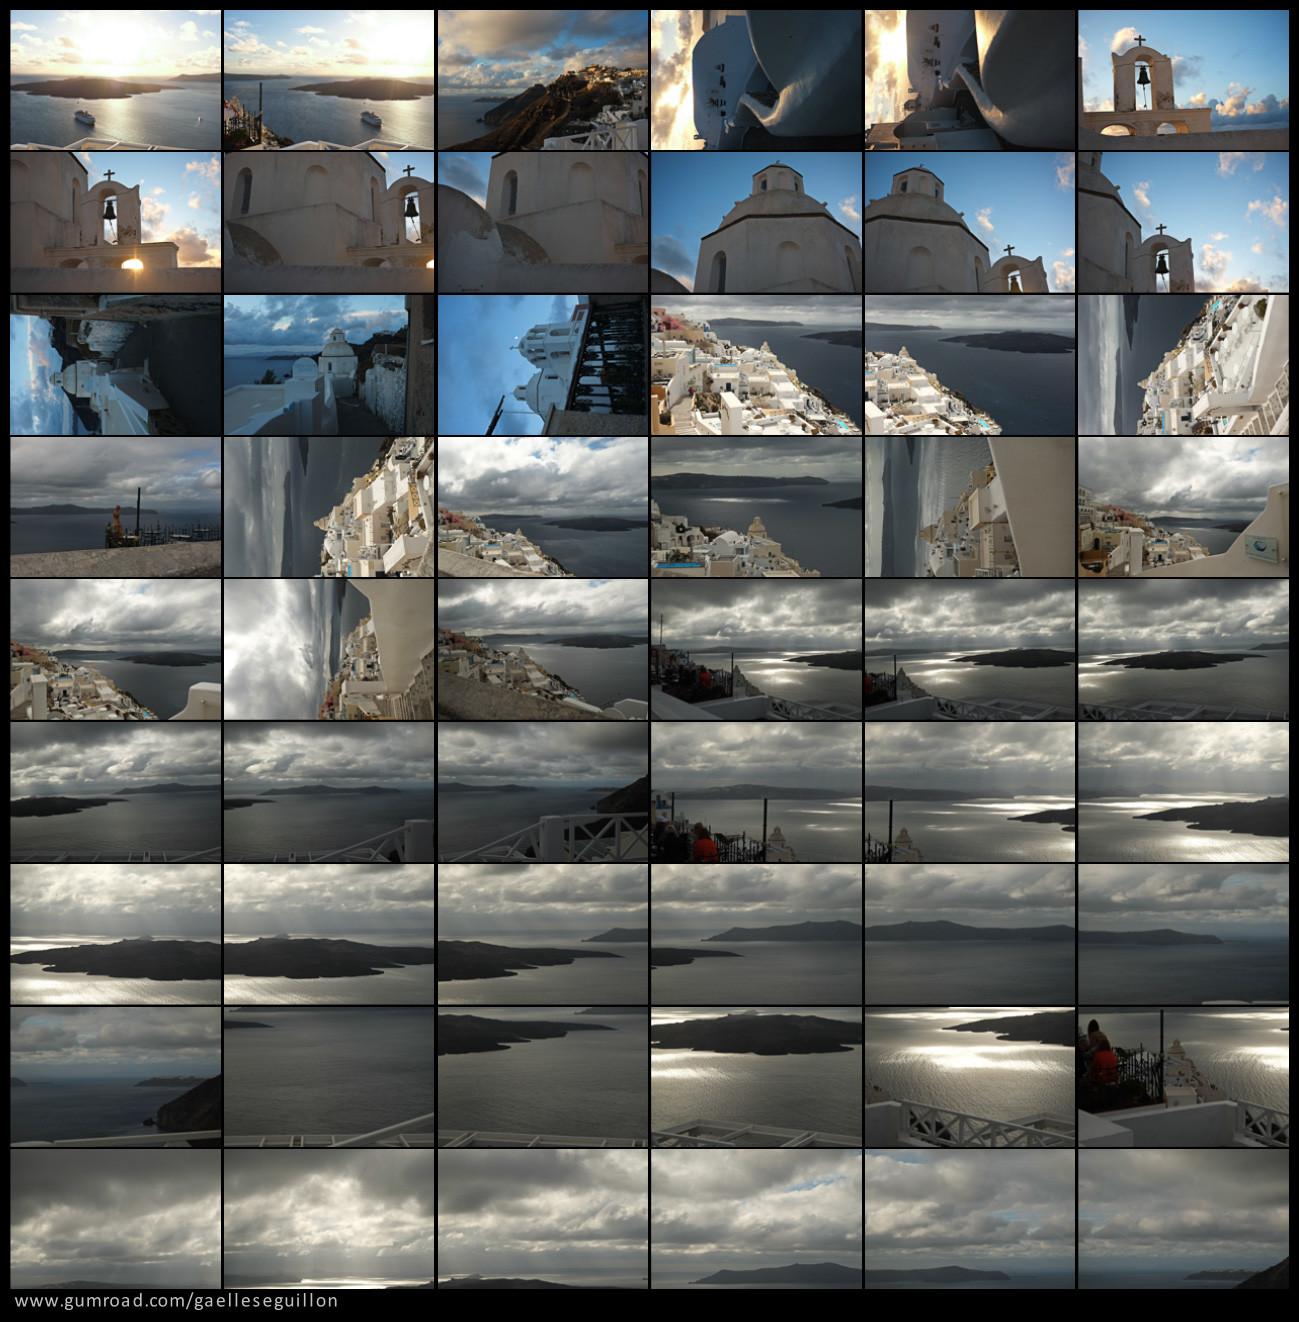 Santorini preview 4